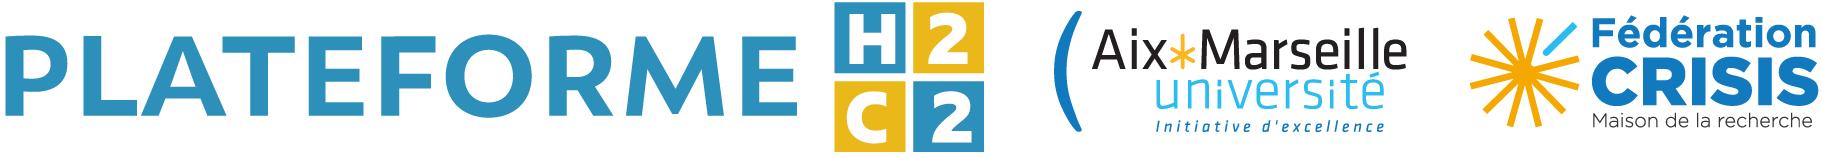 Plateforme H2C2